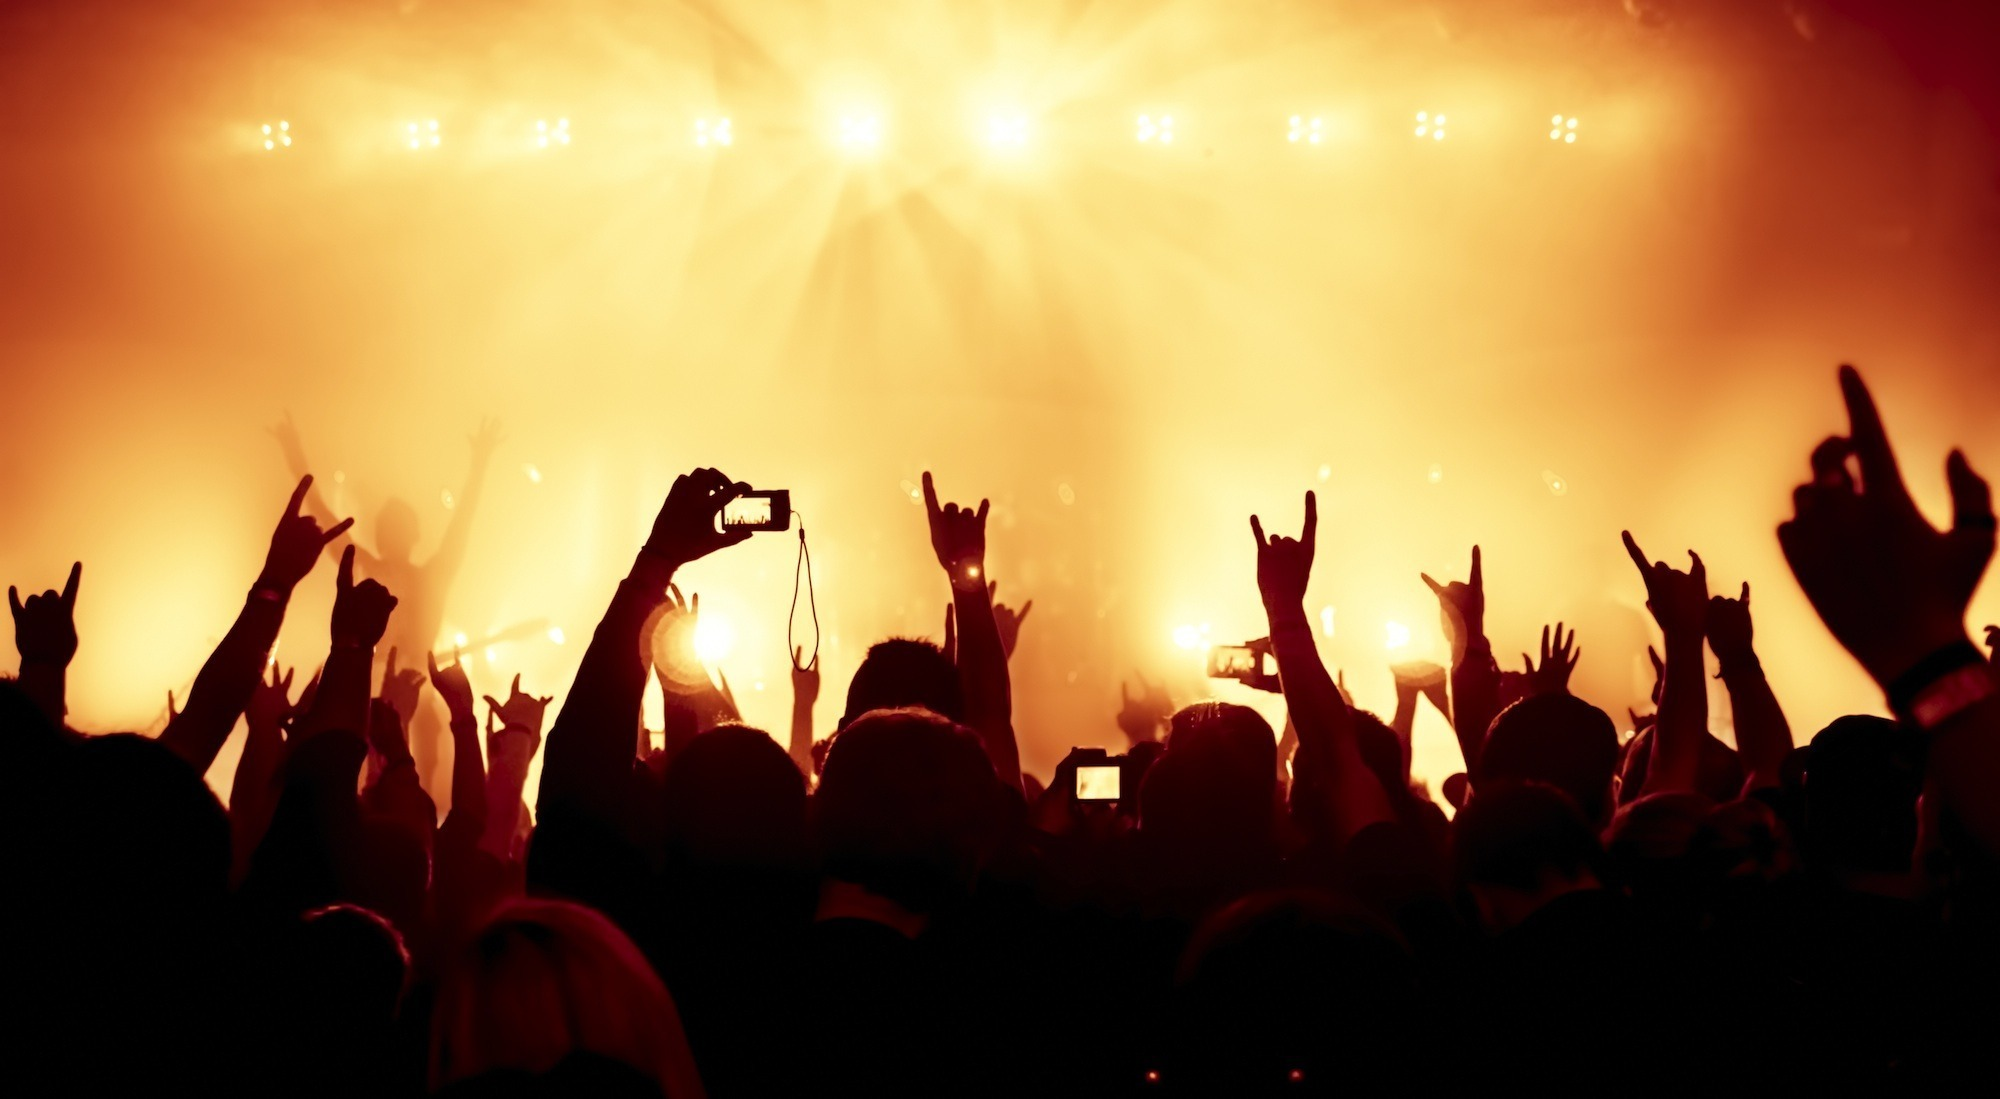 http://shbabbek.com/upload/خروجات الأربعاء كلها سلطنة.. شعر وإنشاد ديني وأغاني تراث